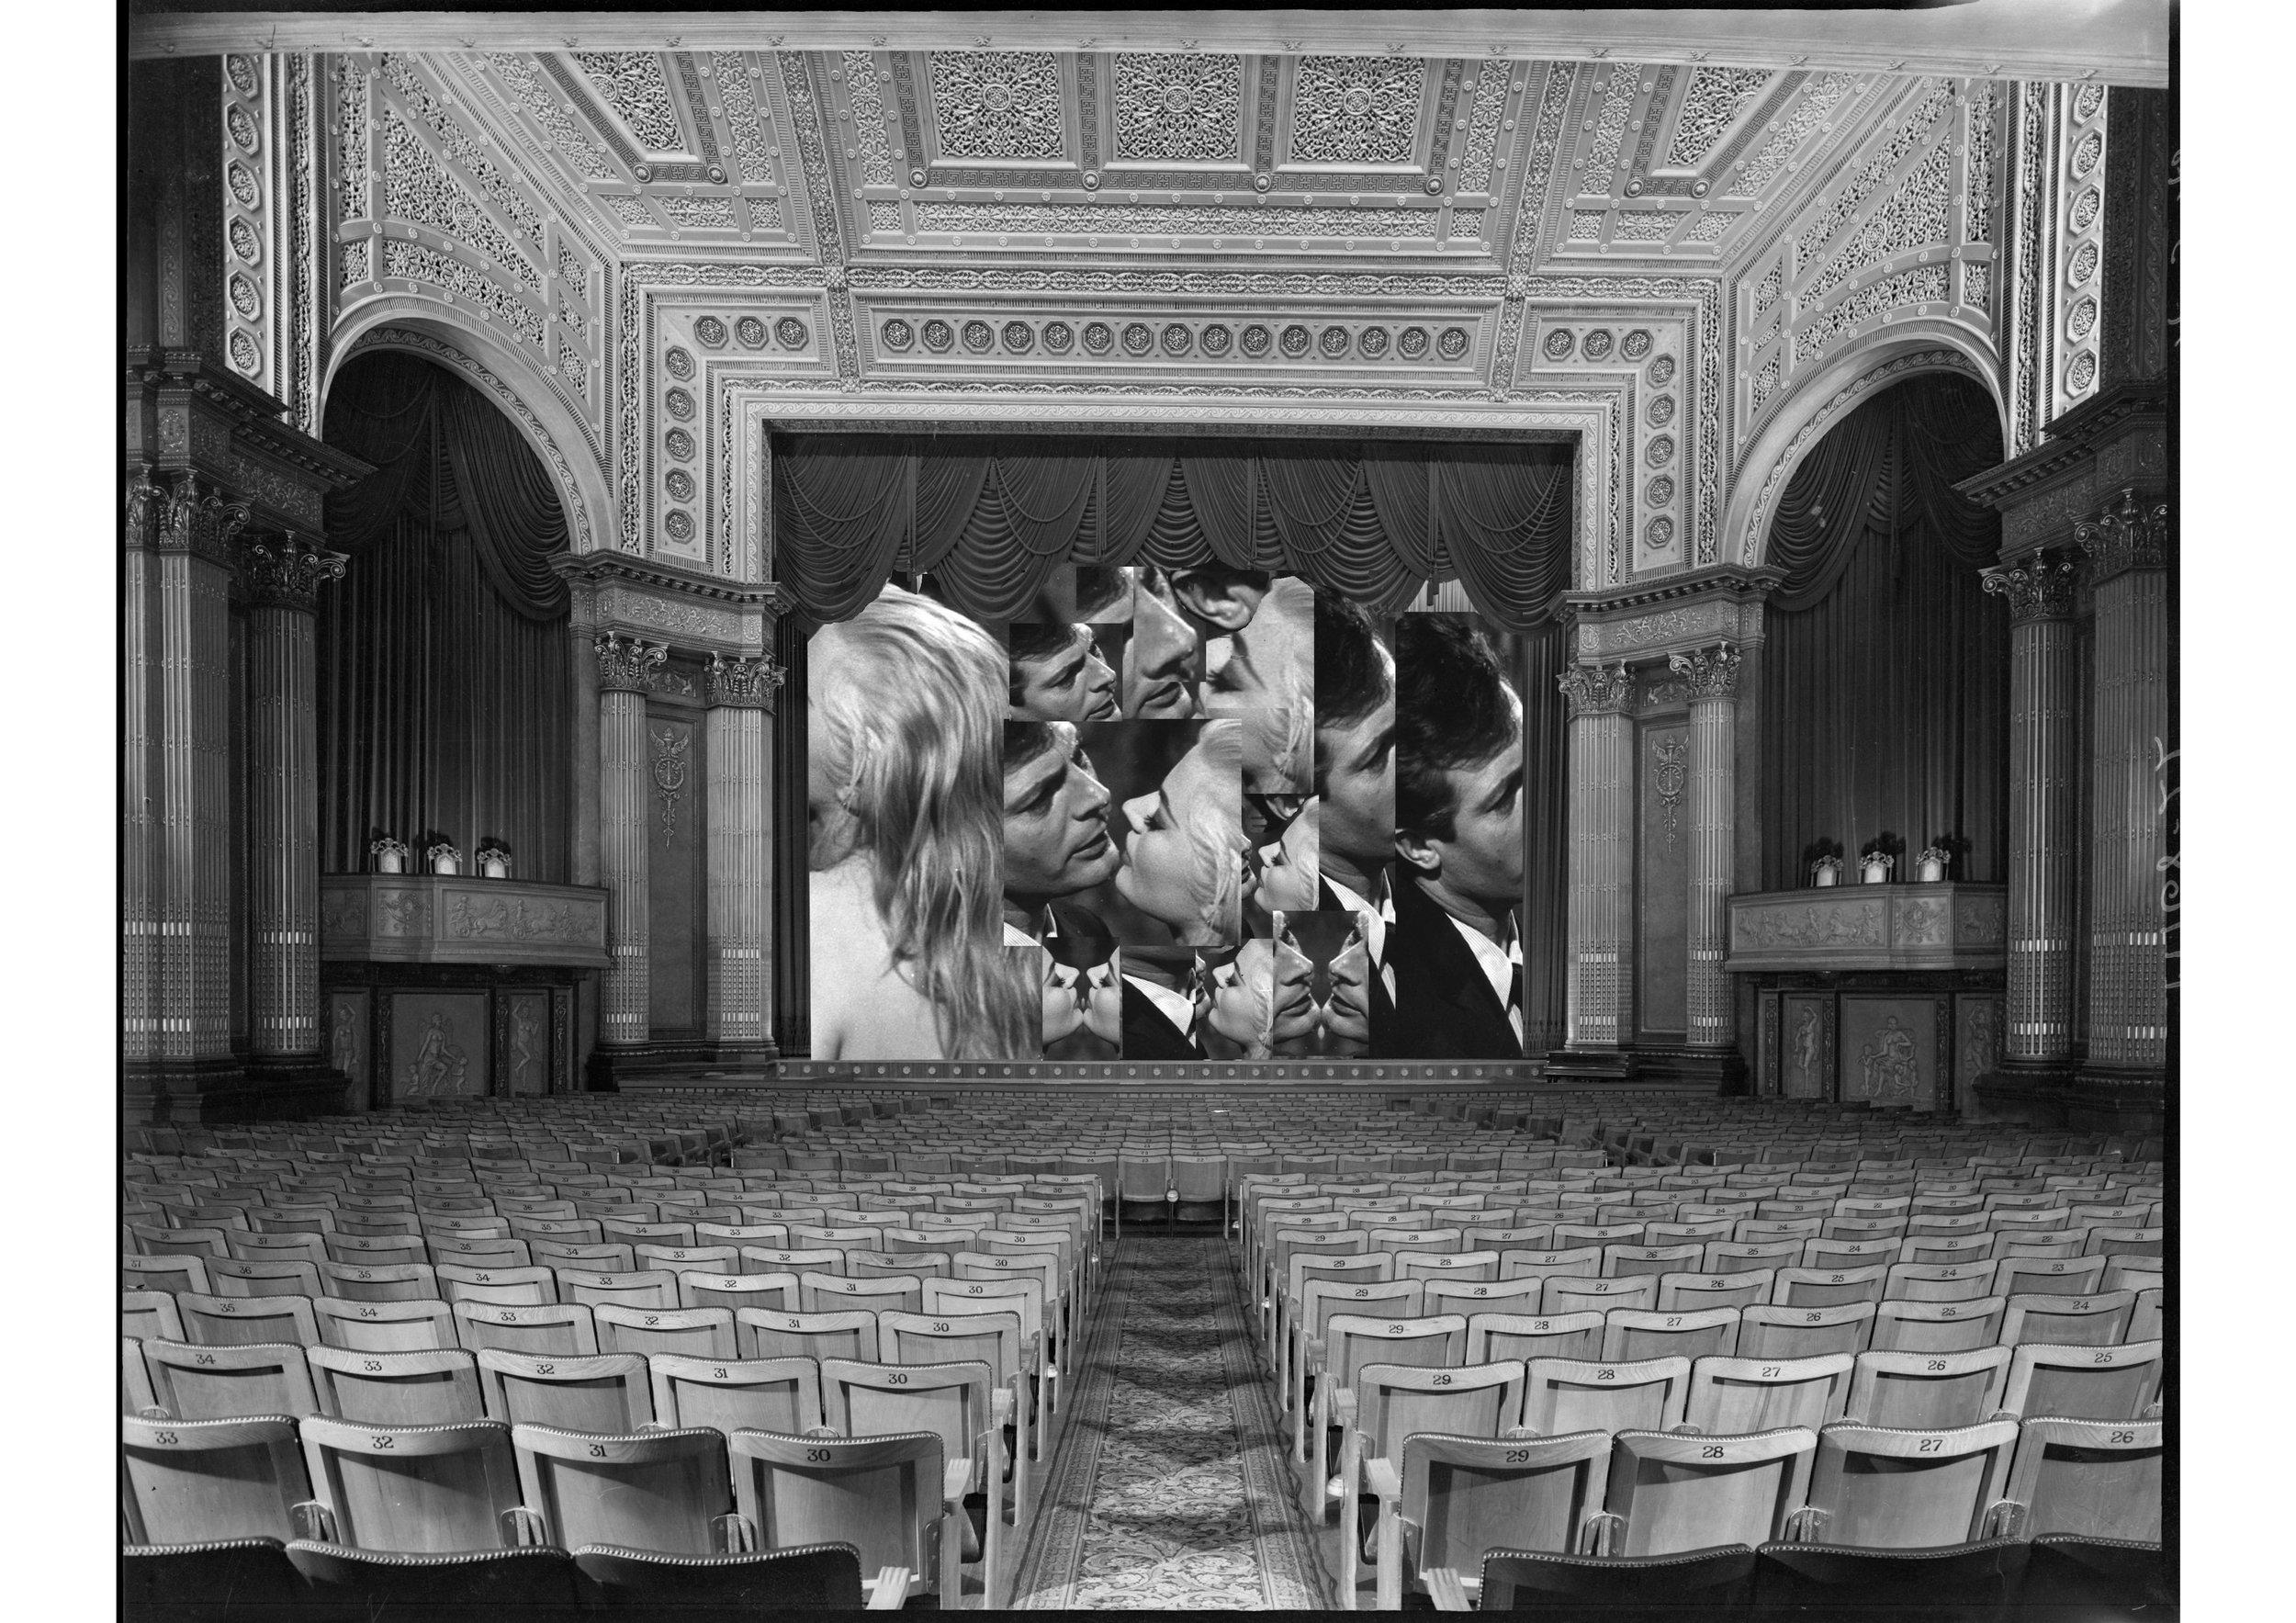 Original theatre image courtesy of State Library of Victoria